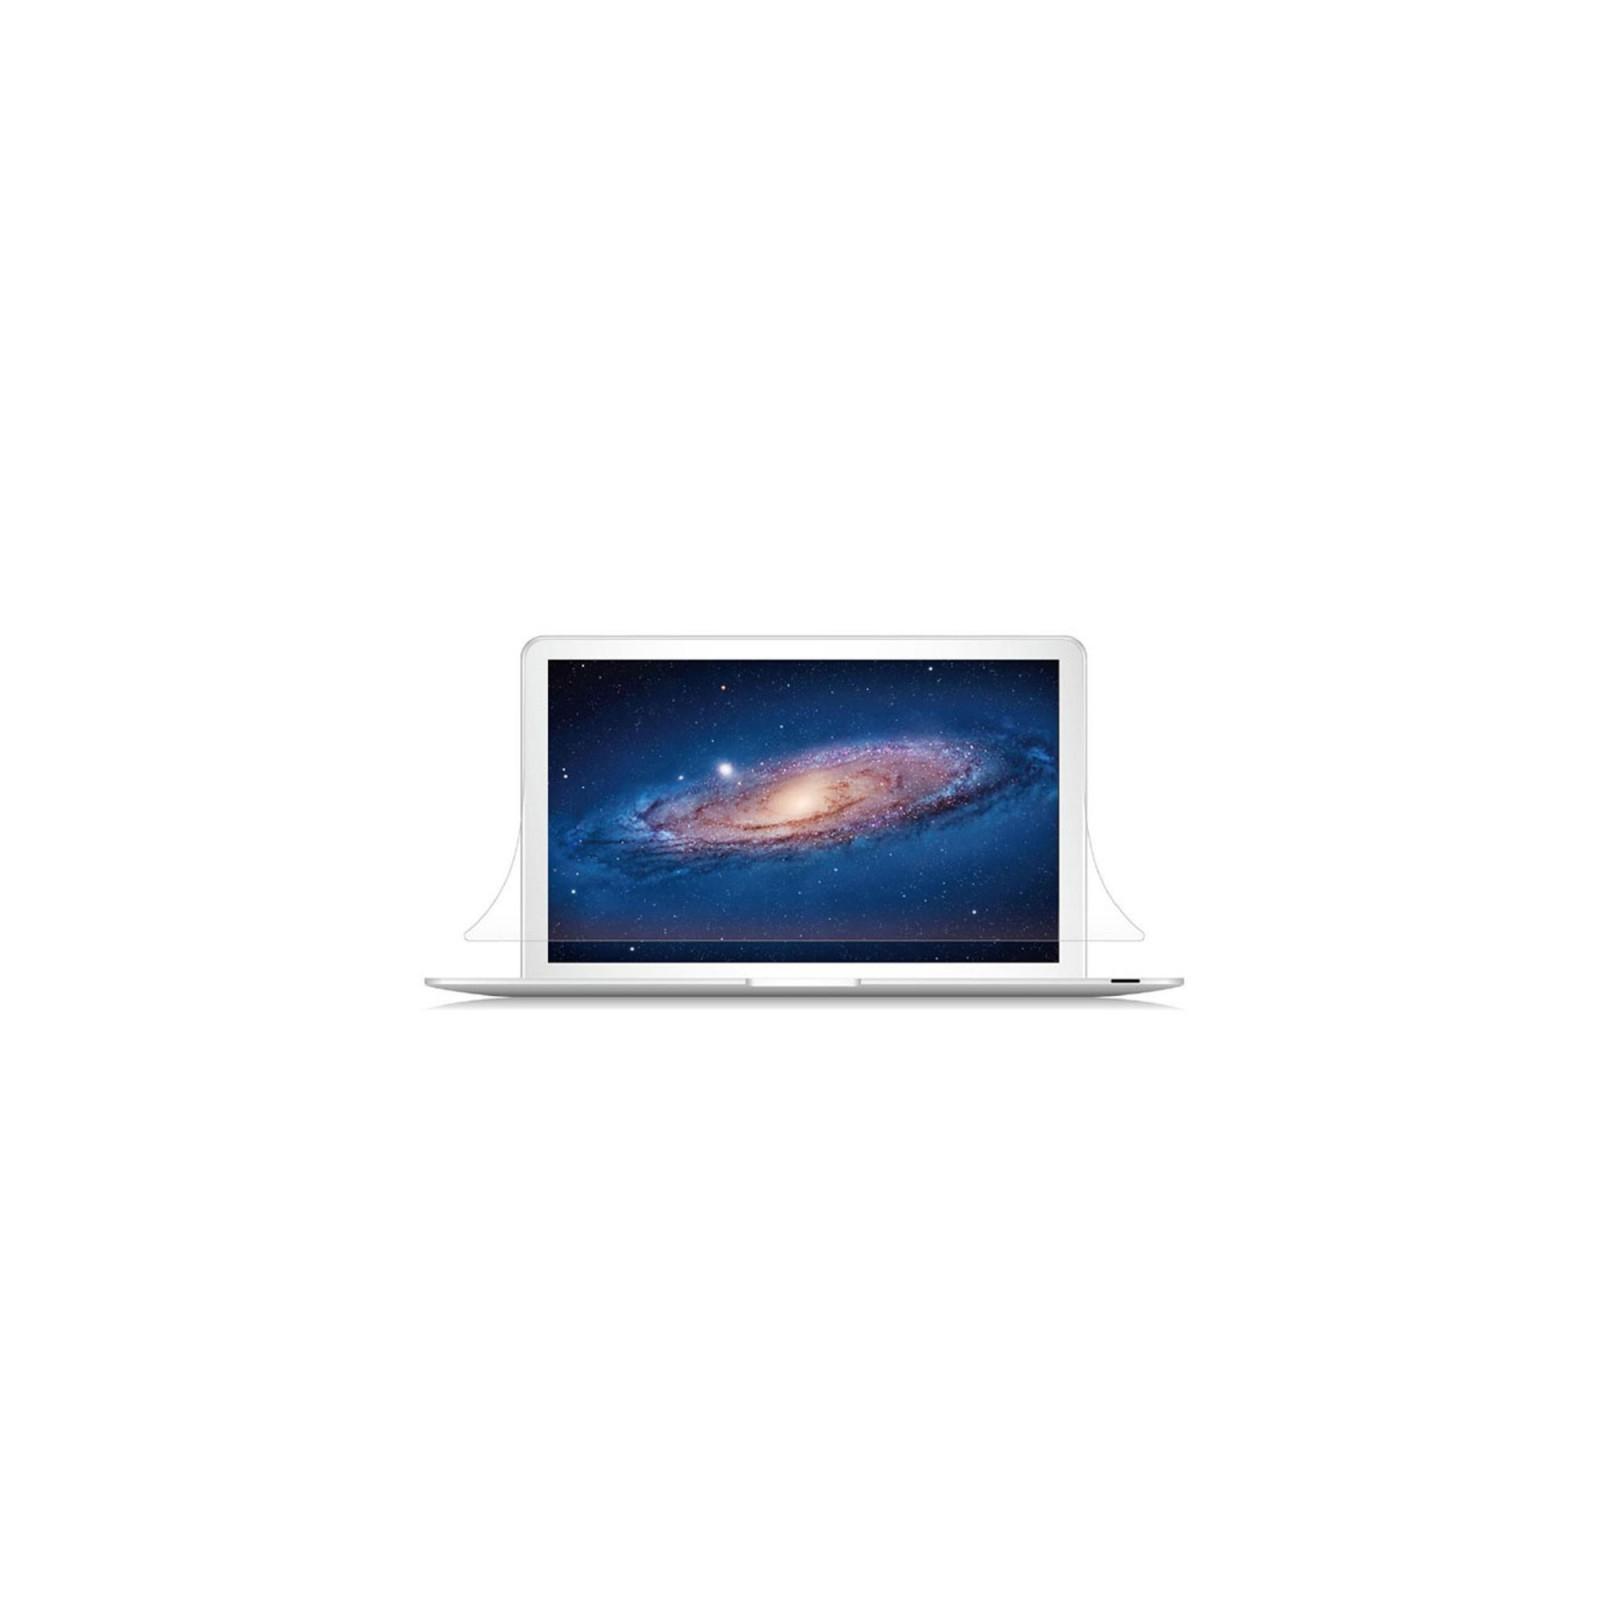 Пленка защитная JCPAL iWoda для MacBook Pro 13 (High Transparency) (JCP2011) изображение 3